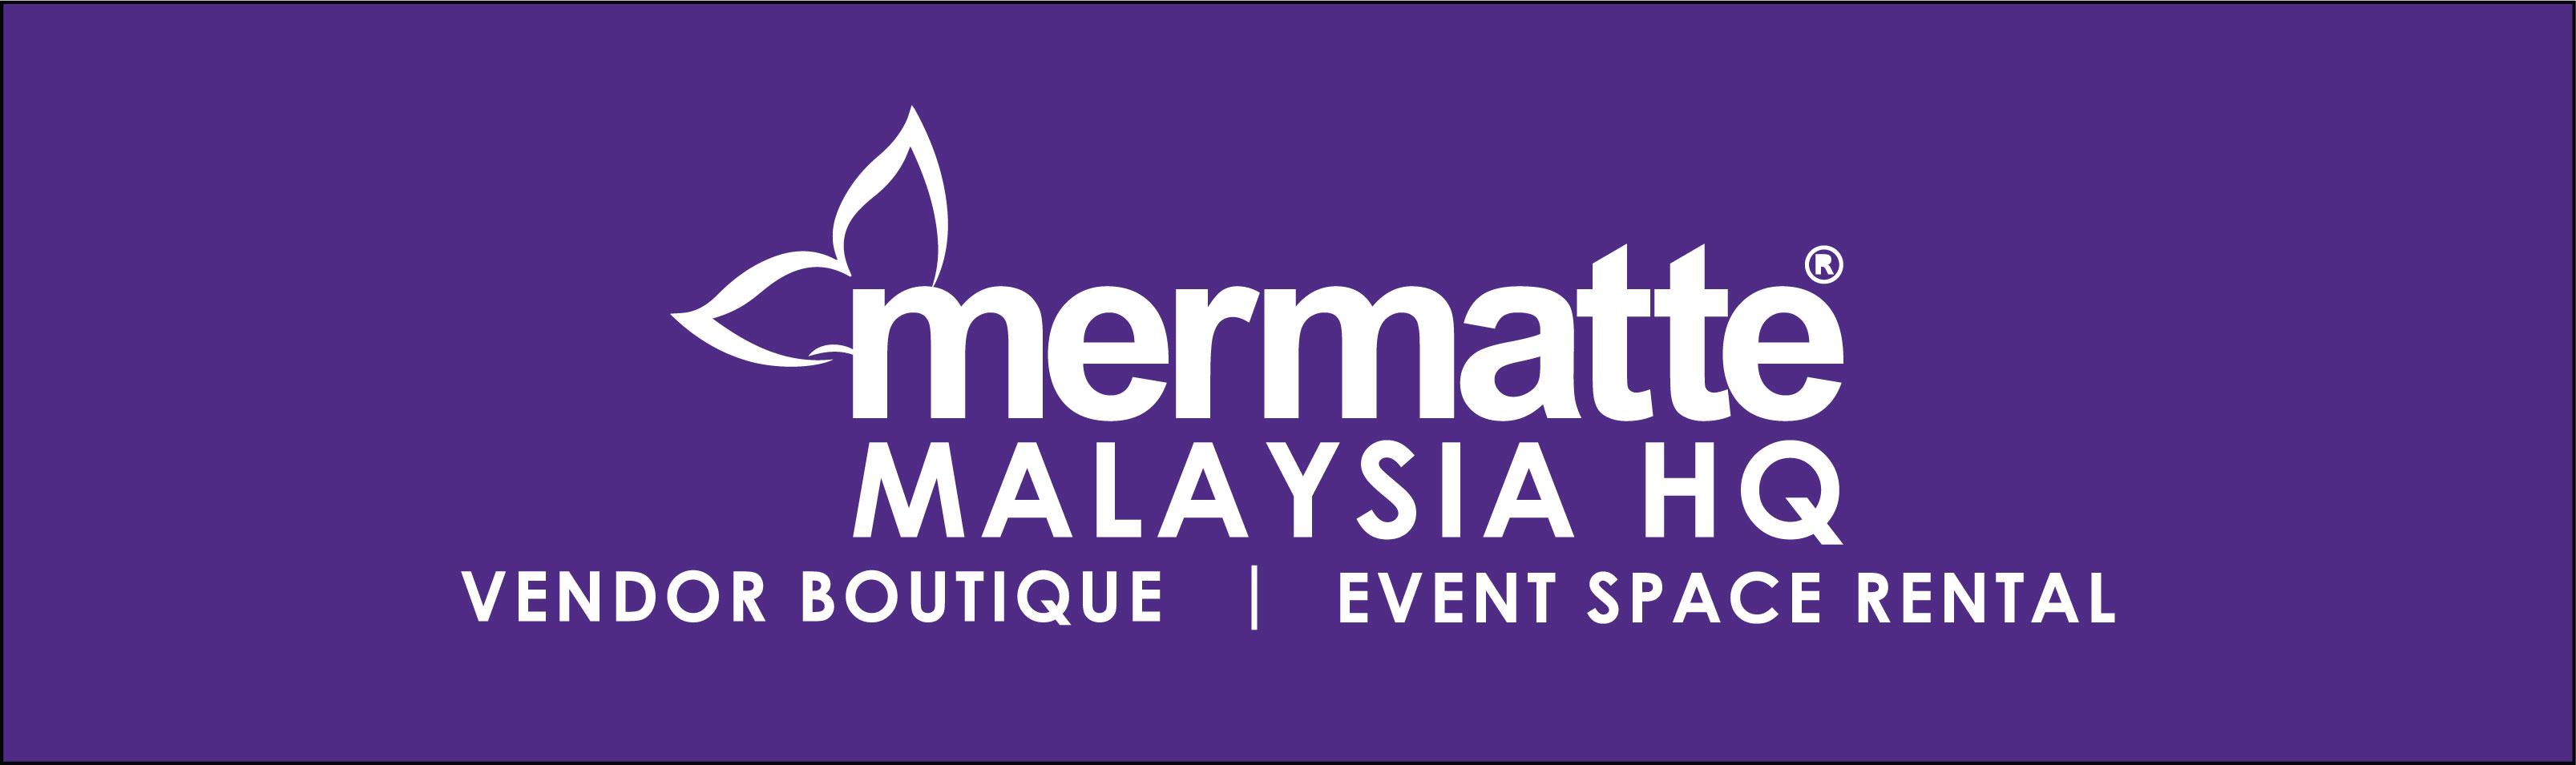 Mermatte Malaysia HQ